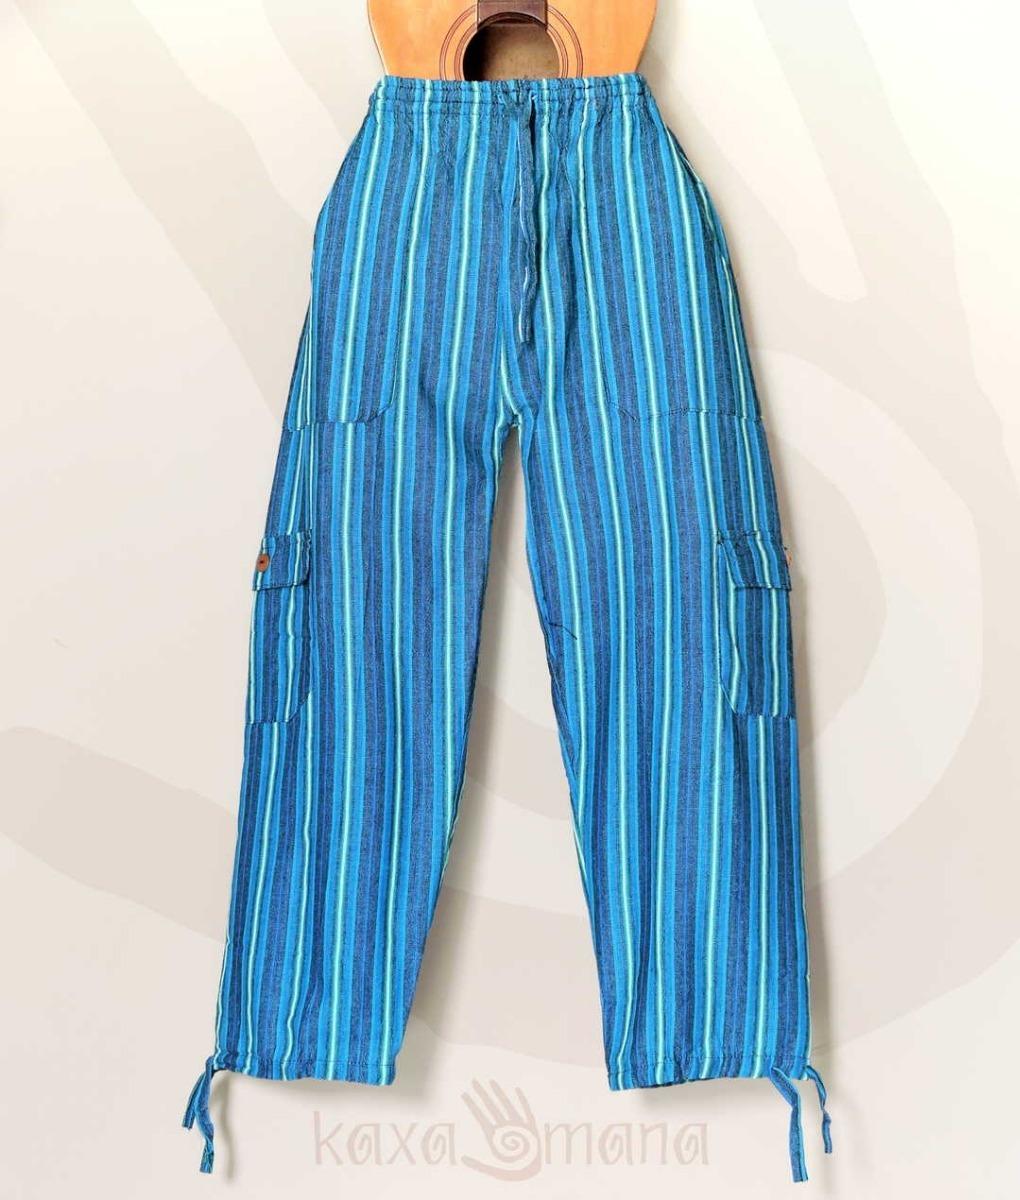 4c42209c05cf0e Calça Pantalona Peruana Hippie Moda Unissex